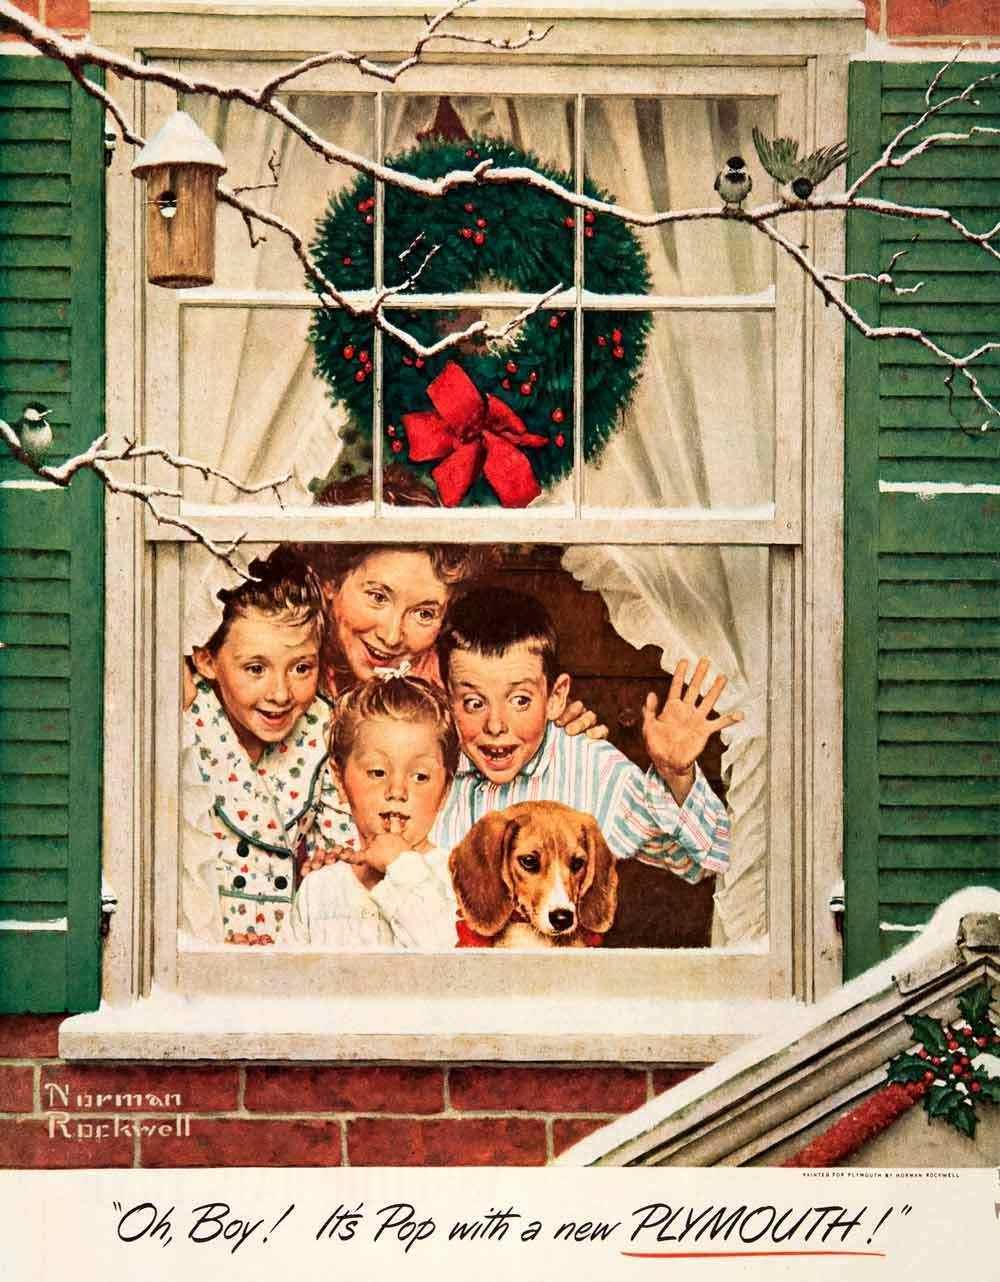 1000x1282px Norman Rockwell Christmas Wallpaper - WallpaperSafari